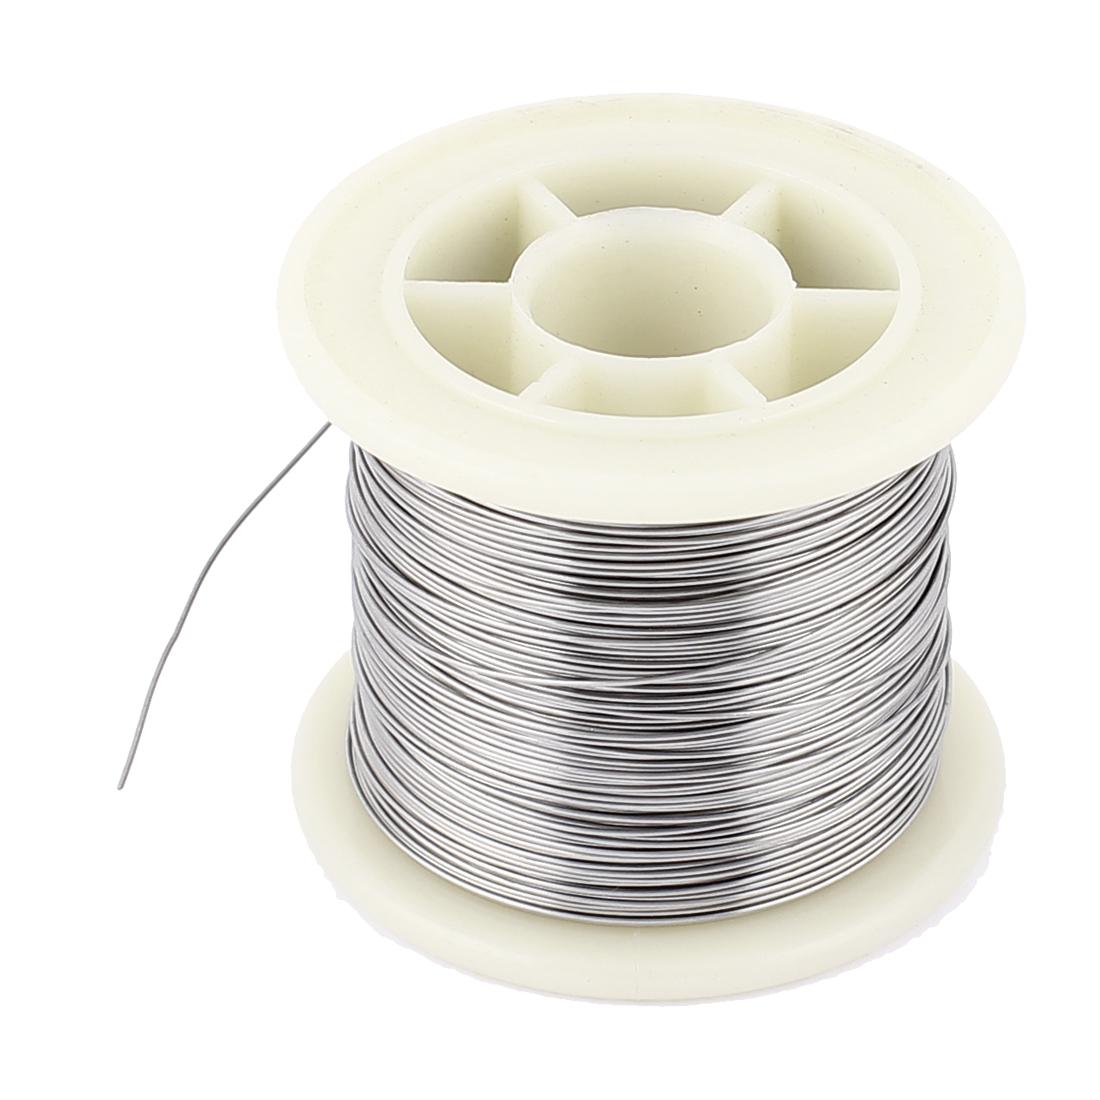 FeCrAl 0.5mm 24 Gauge AWG 3.38oz 115ft Roll Heating Heater Wire